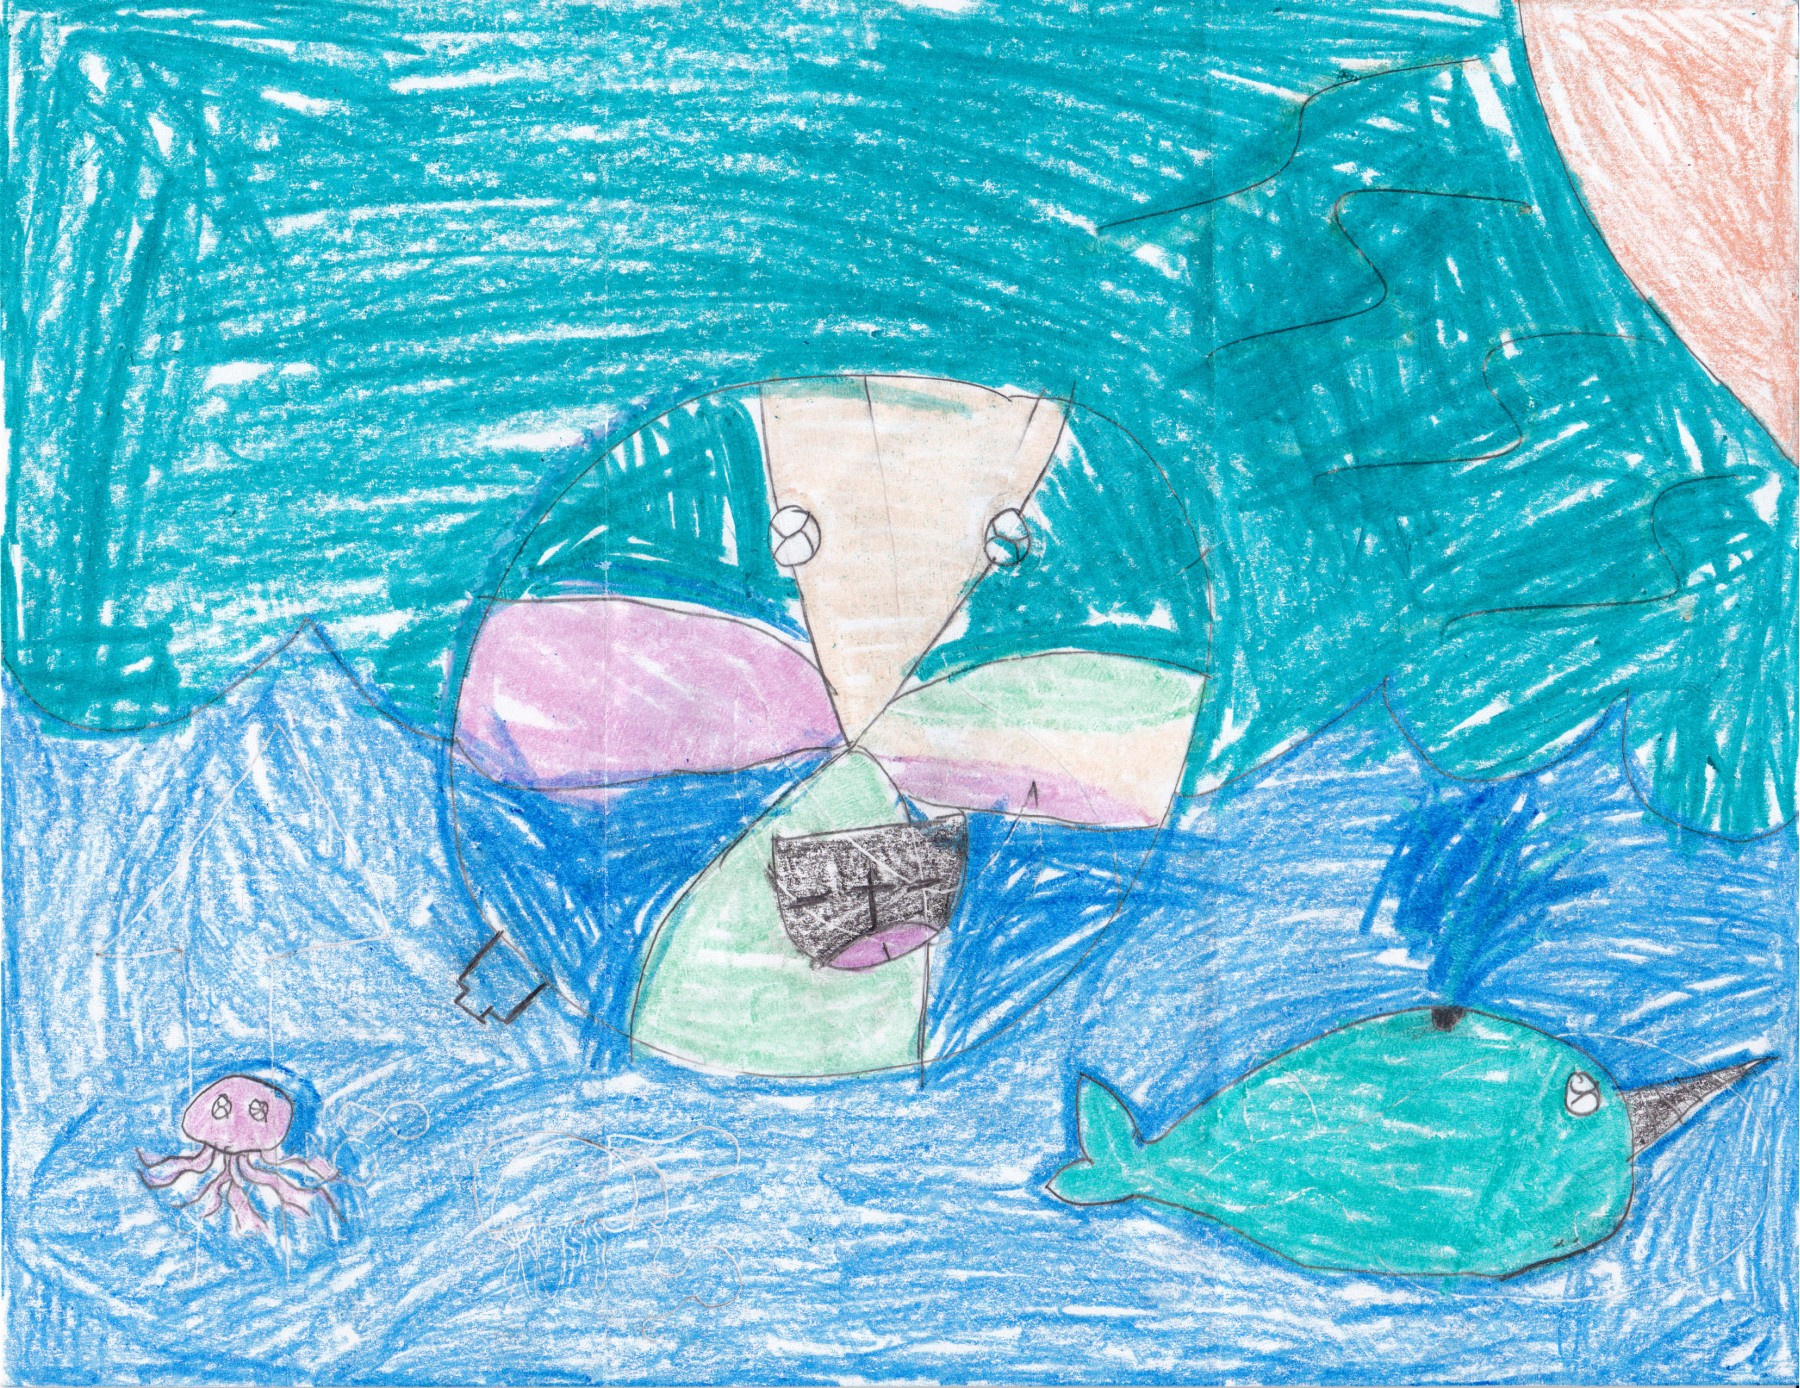 Earlaina Pankiewicz - Age 8